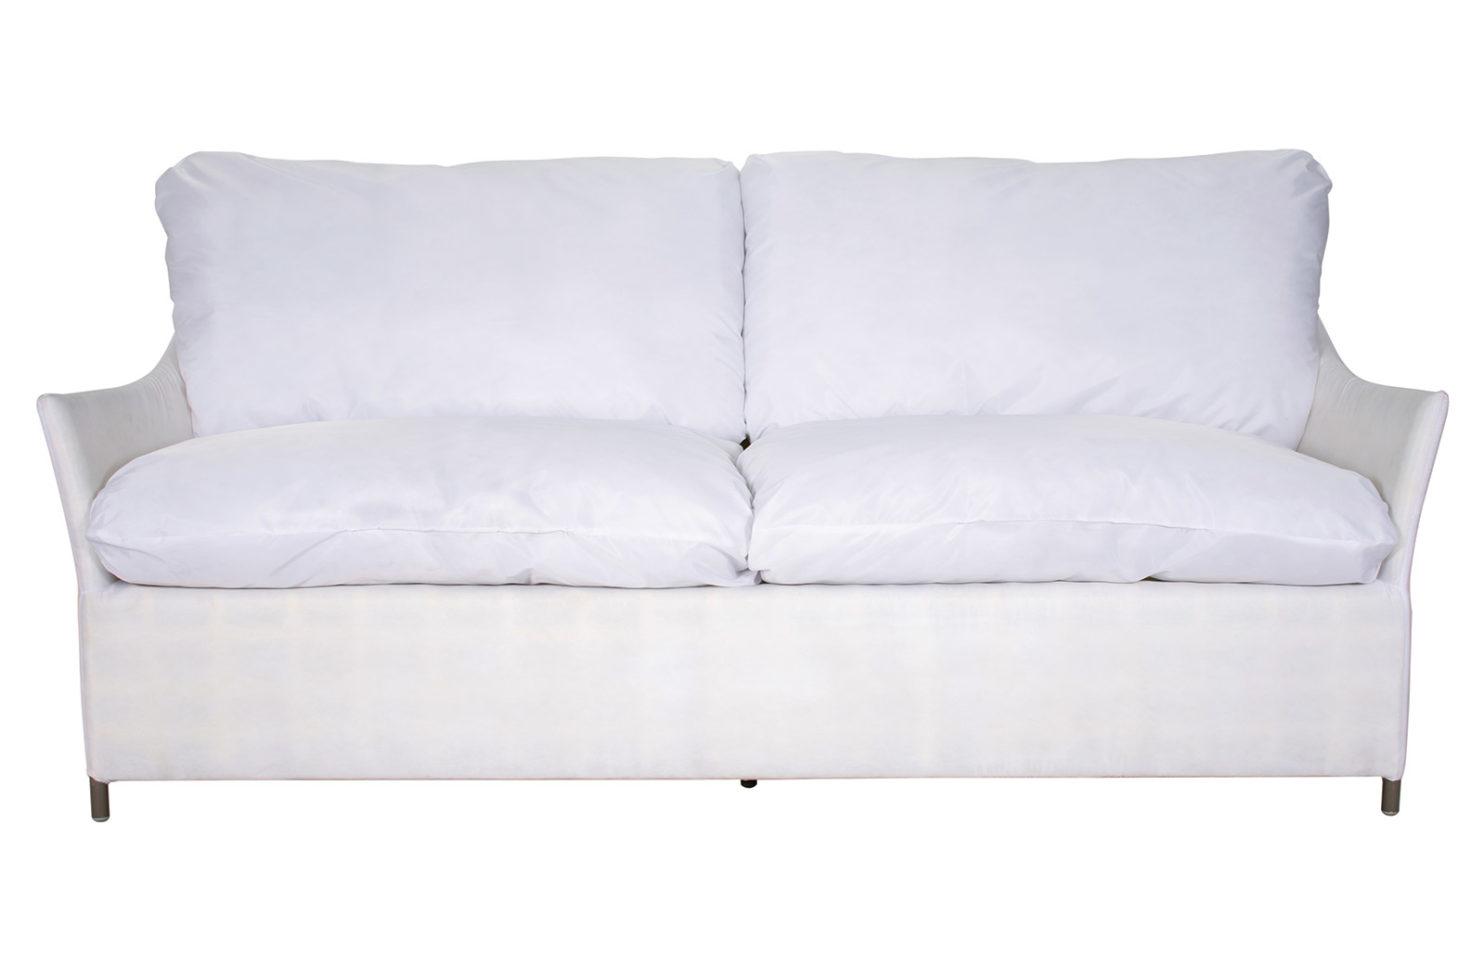 capri sofa frame 620FT094P2 1 front